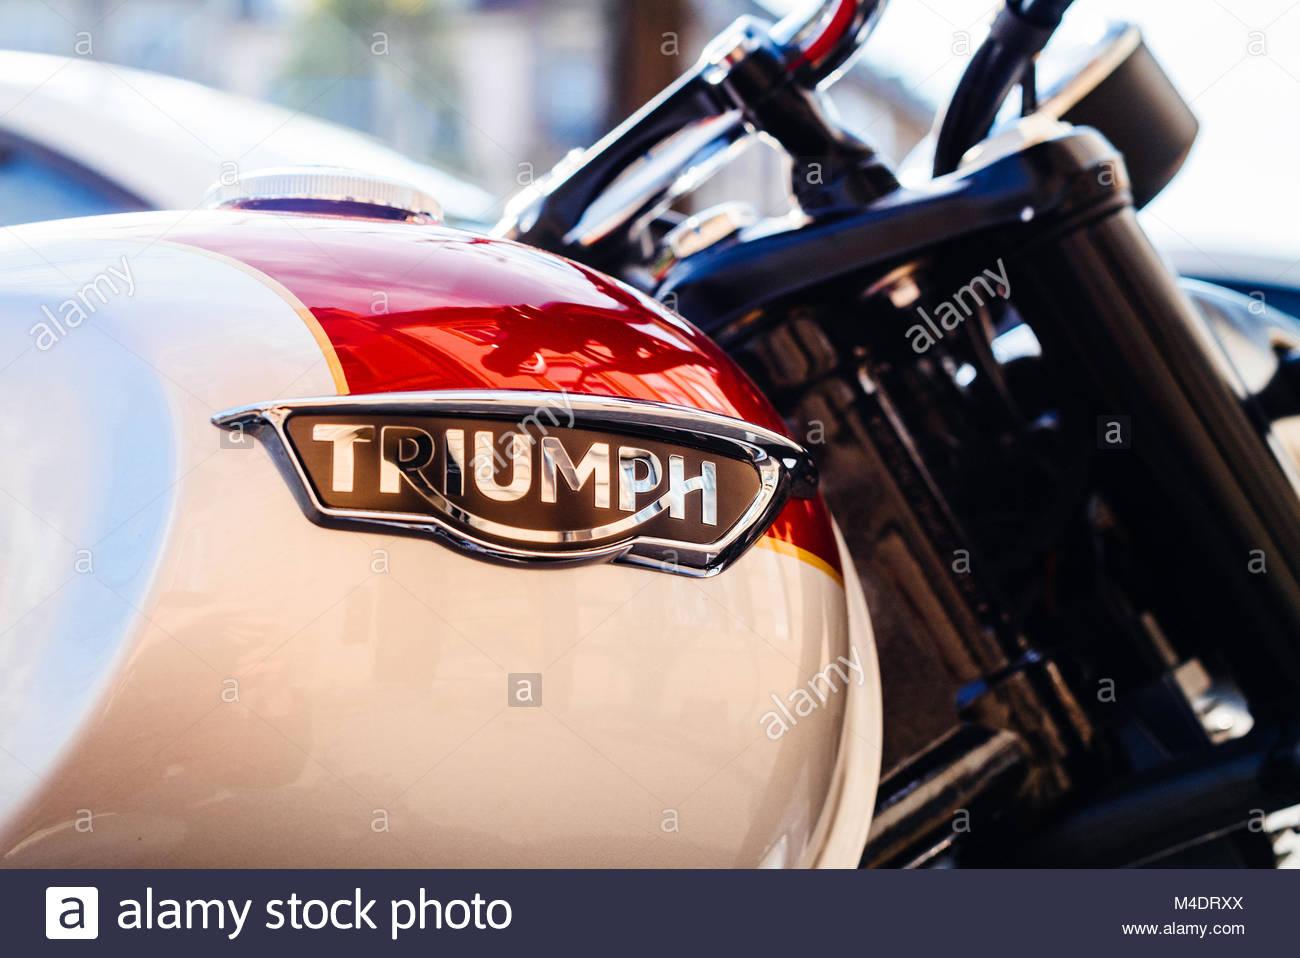 Triumph motorcycles logotype on vintage bike - Stock Image